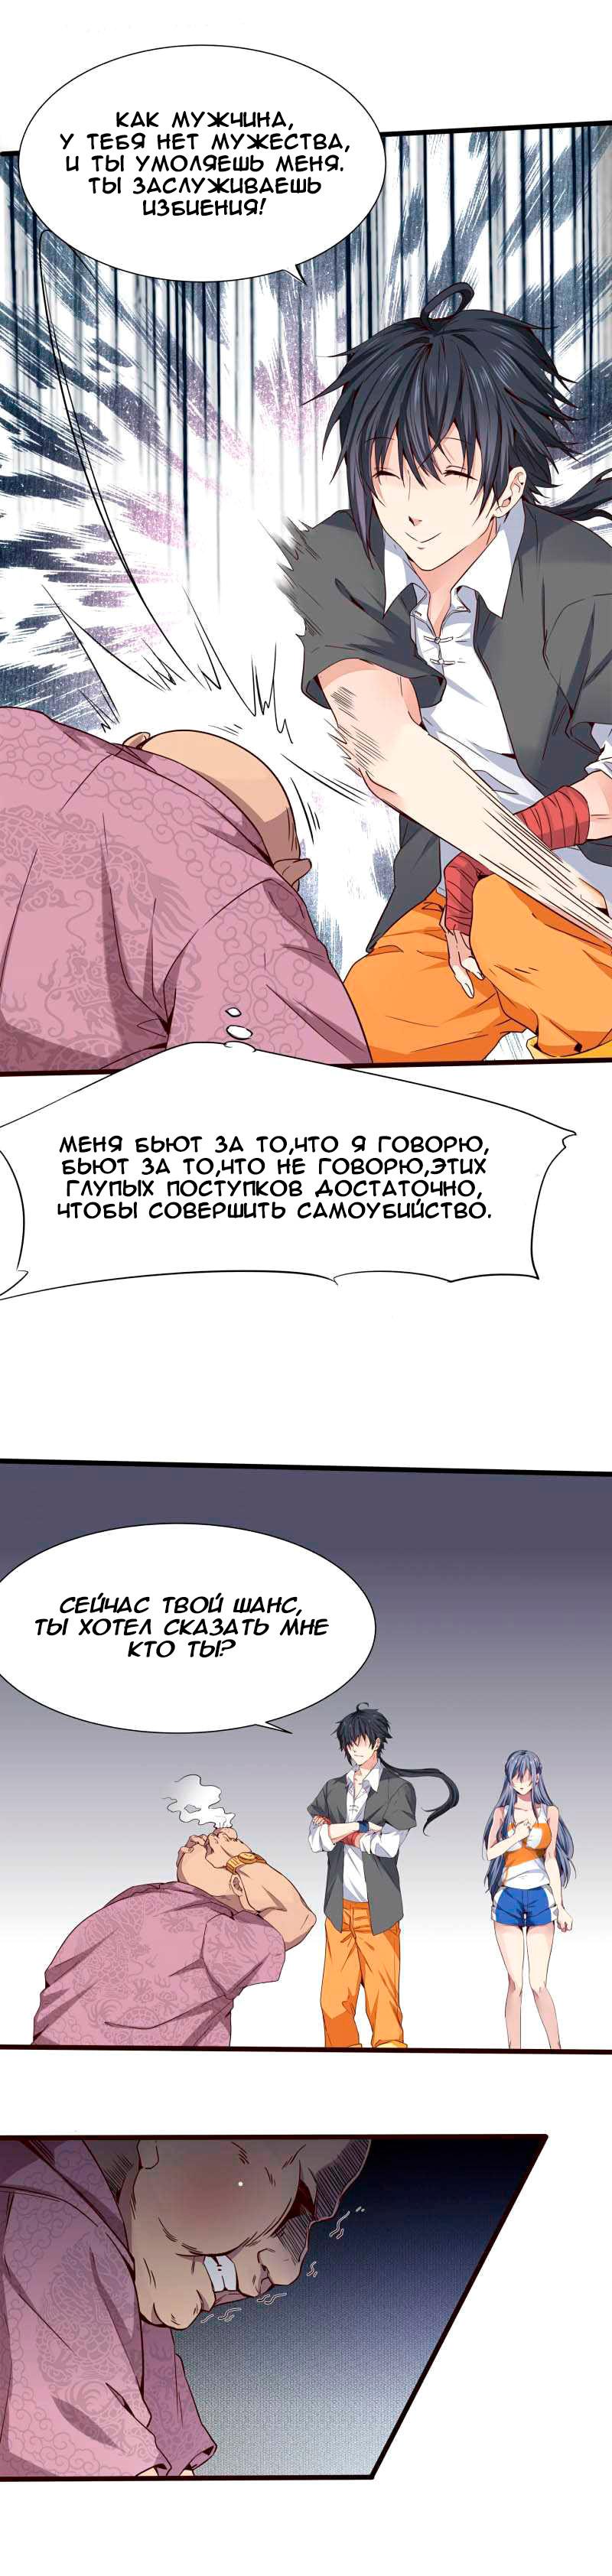 Манга Первоклассный мастер / First Rate Master  - Том 1 Глава 2 Страница 11